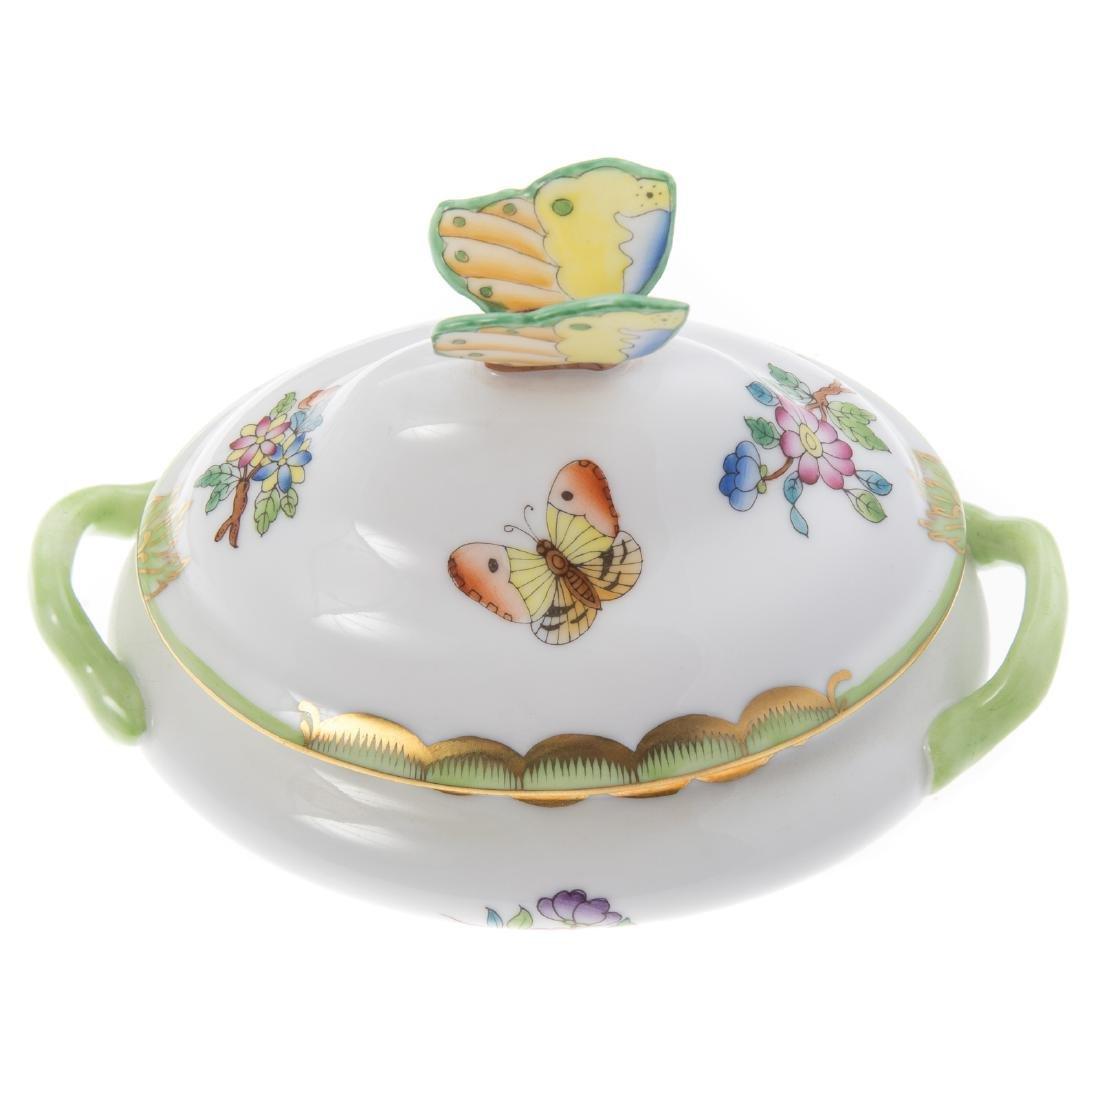 Herend Rothschild Bird soup tureen and platter - 2